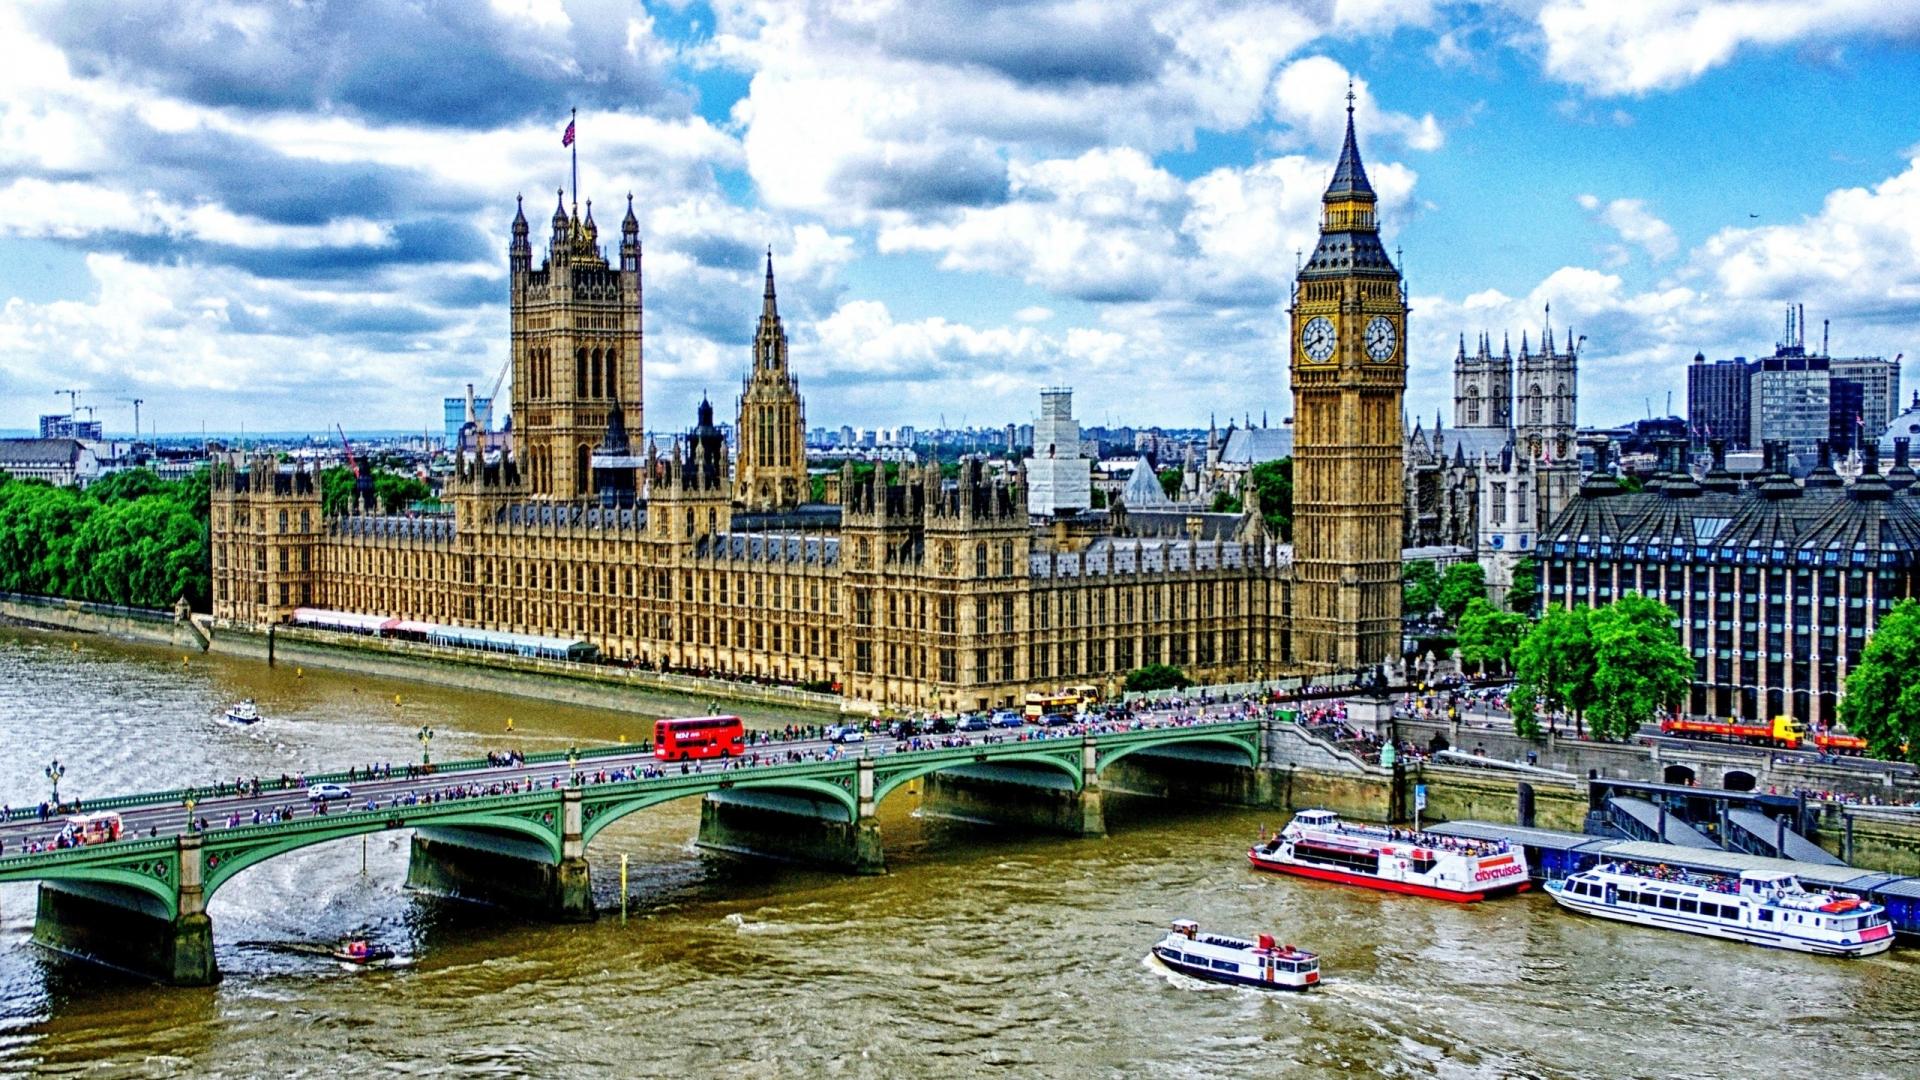 Westminster Bridge from London